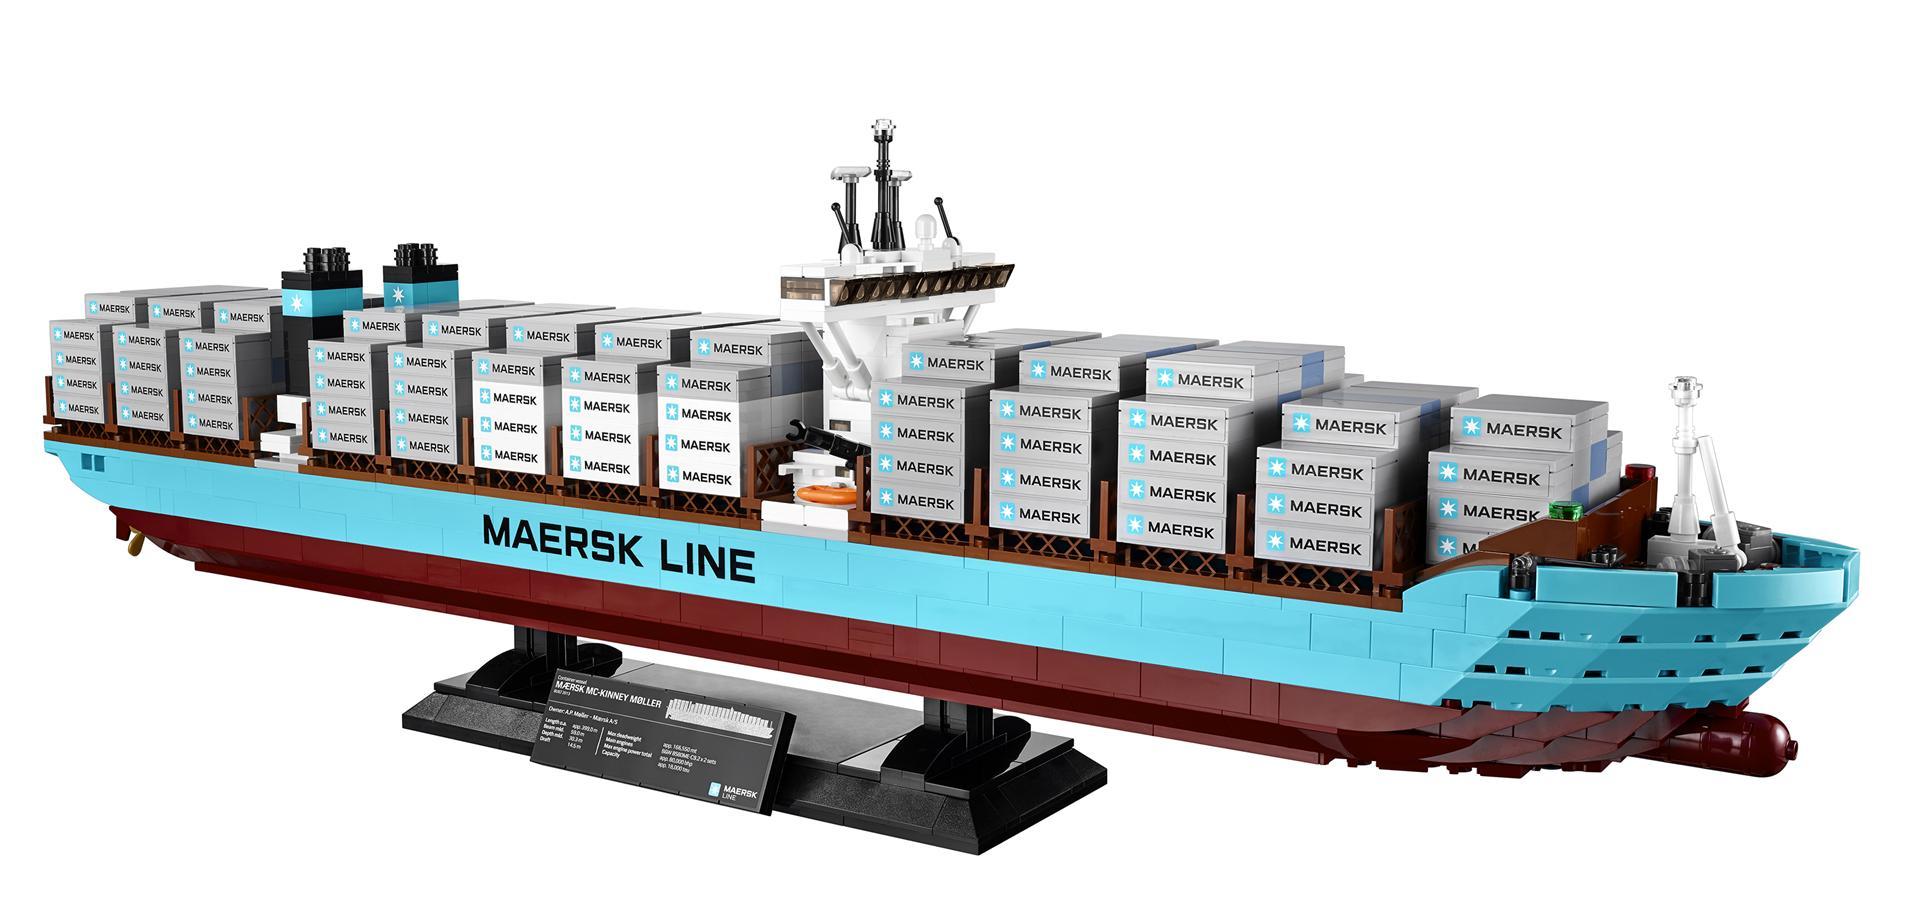 Maersk-Triple-E-10241-1